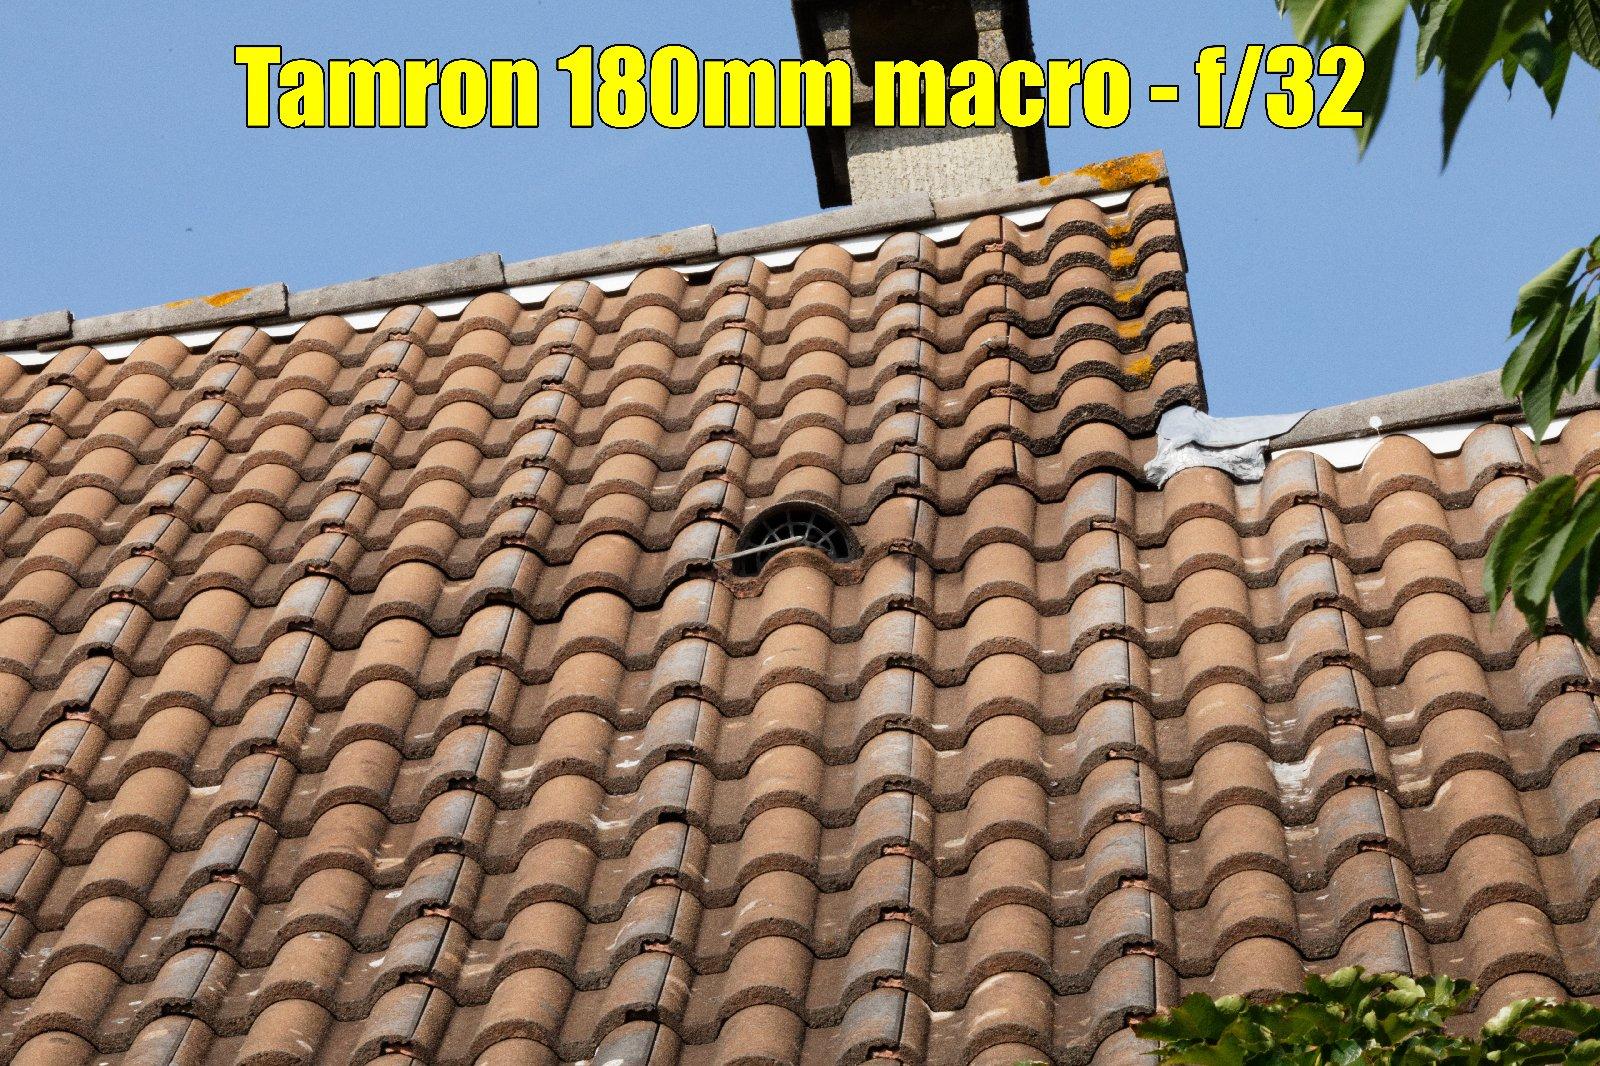 beanico-photo : test du Tamron 180 mm f/3.5 macro